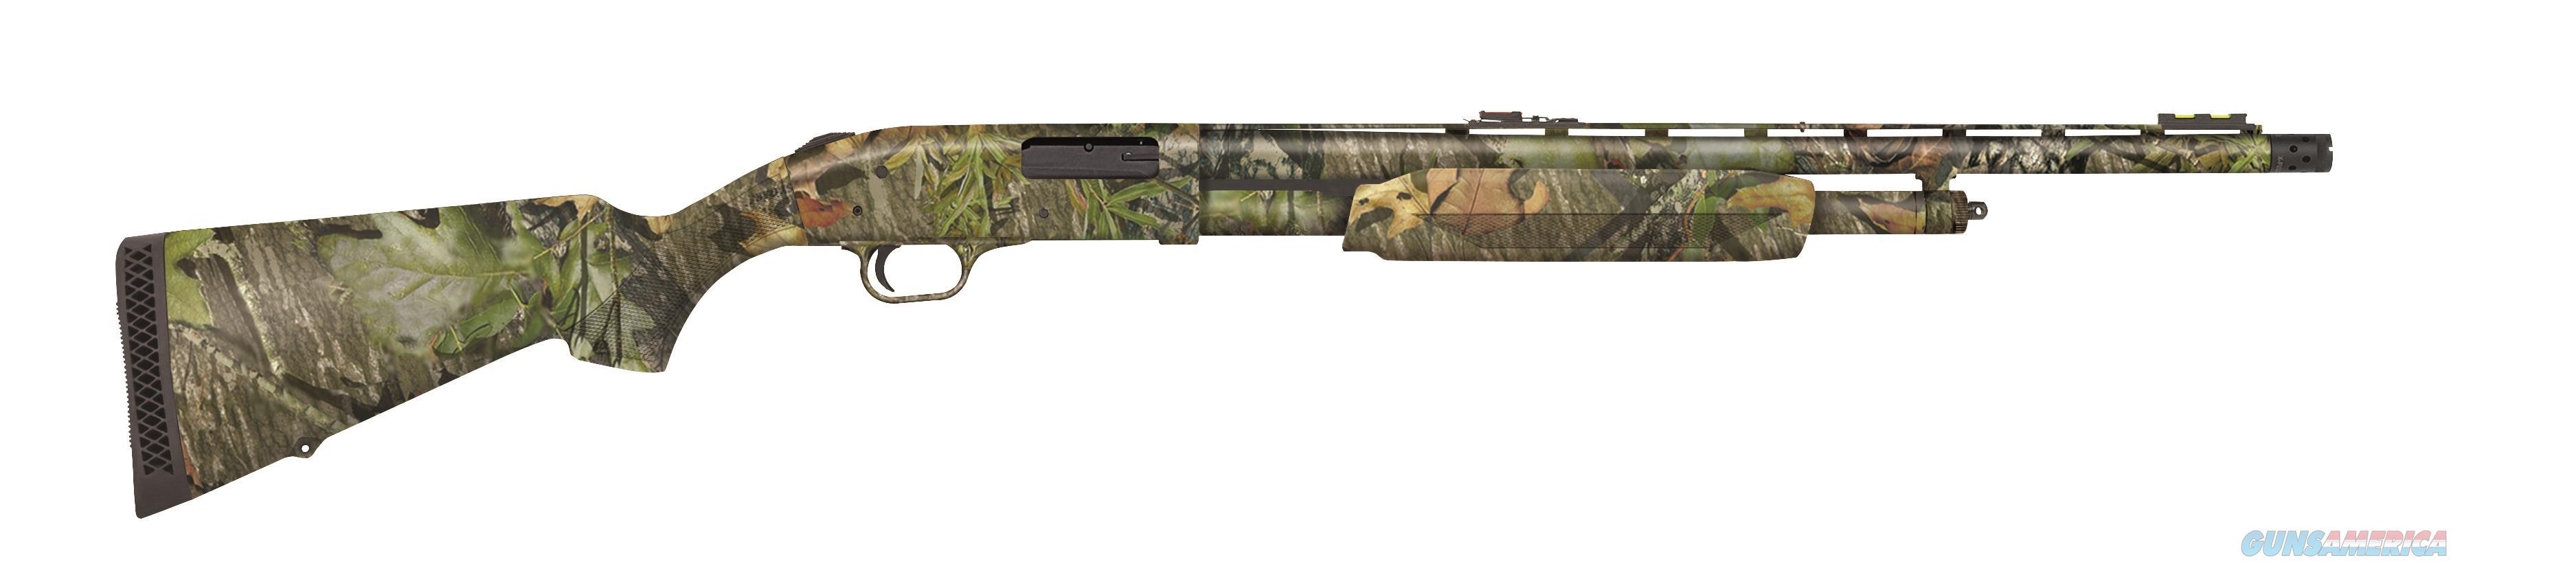 "Mossberg 500 Turkey 20 Gauge 22"" Mossy Oak Obsession 54339  Guns > Shotguns > Mossberg Shotguns > Pump > Sporting"